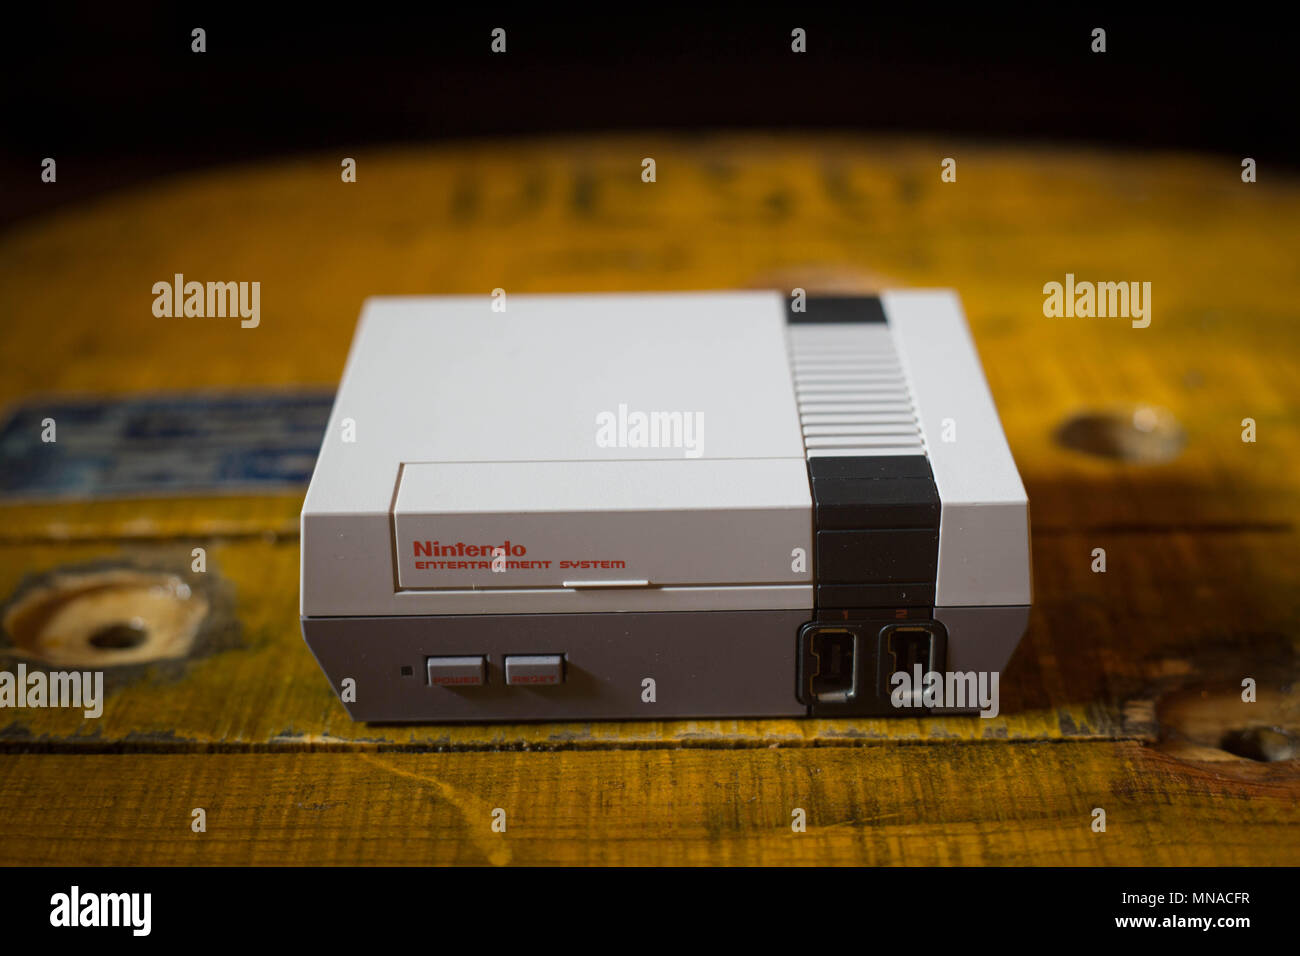 A Nintendo Classic Mini Nintendo Entertainment System Video Game